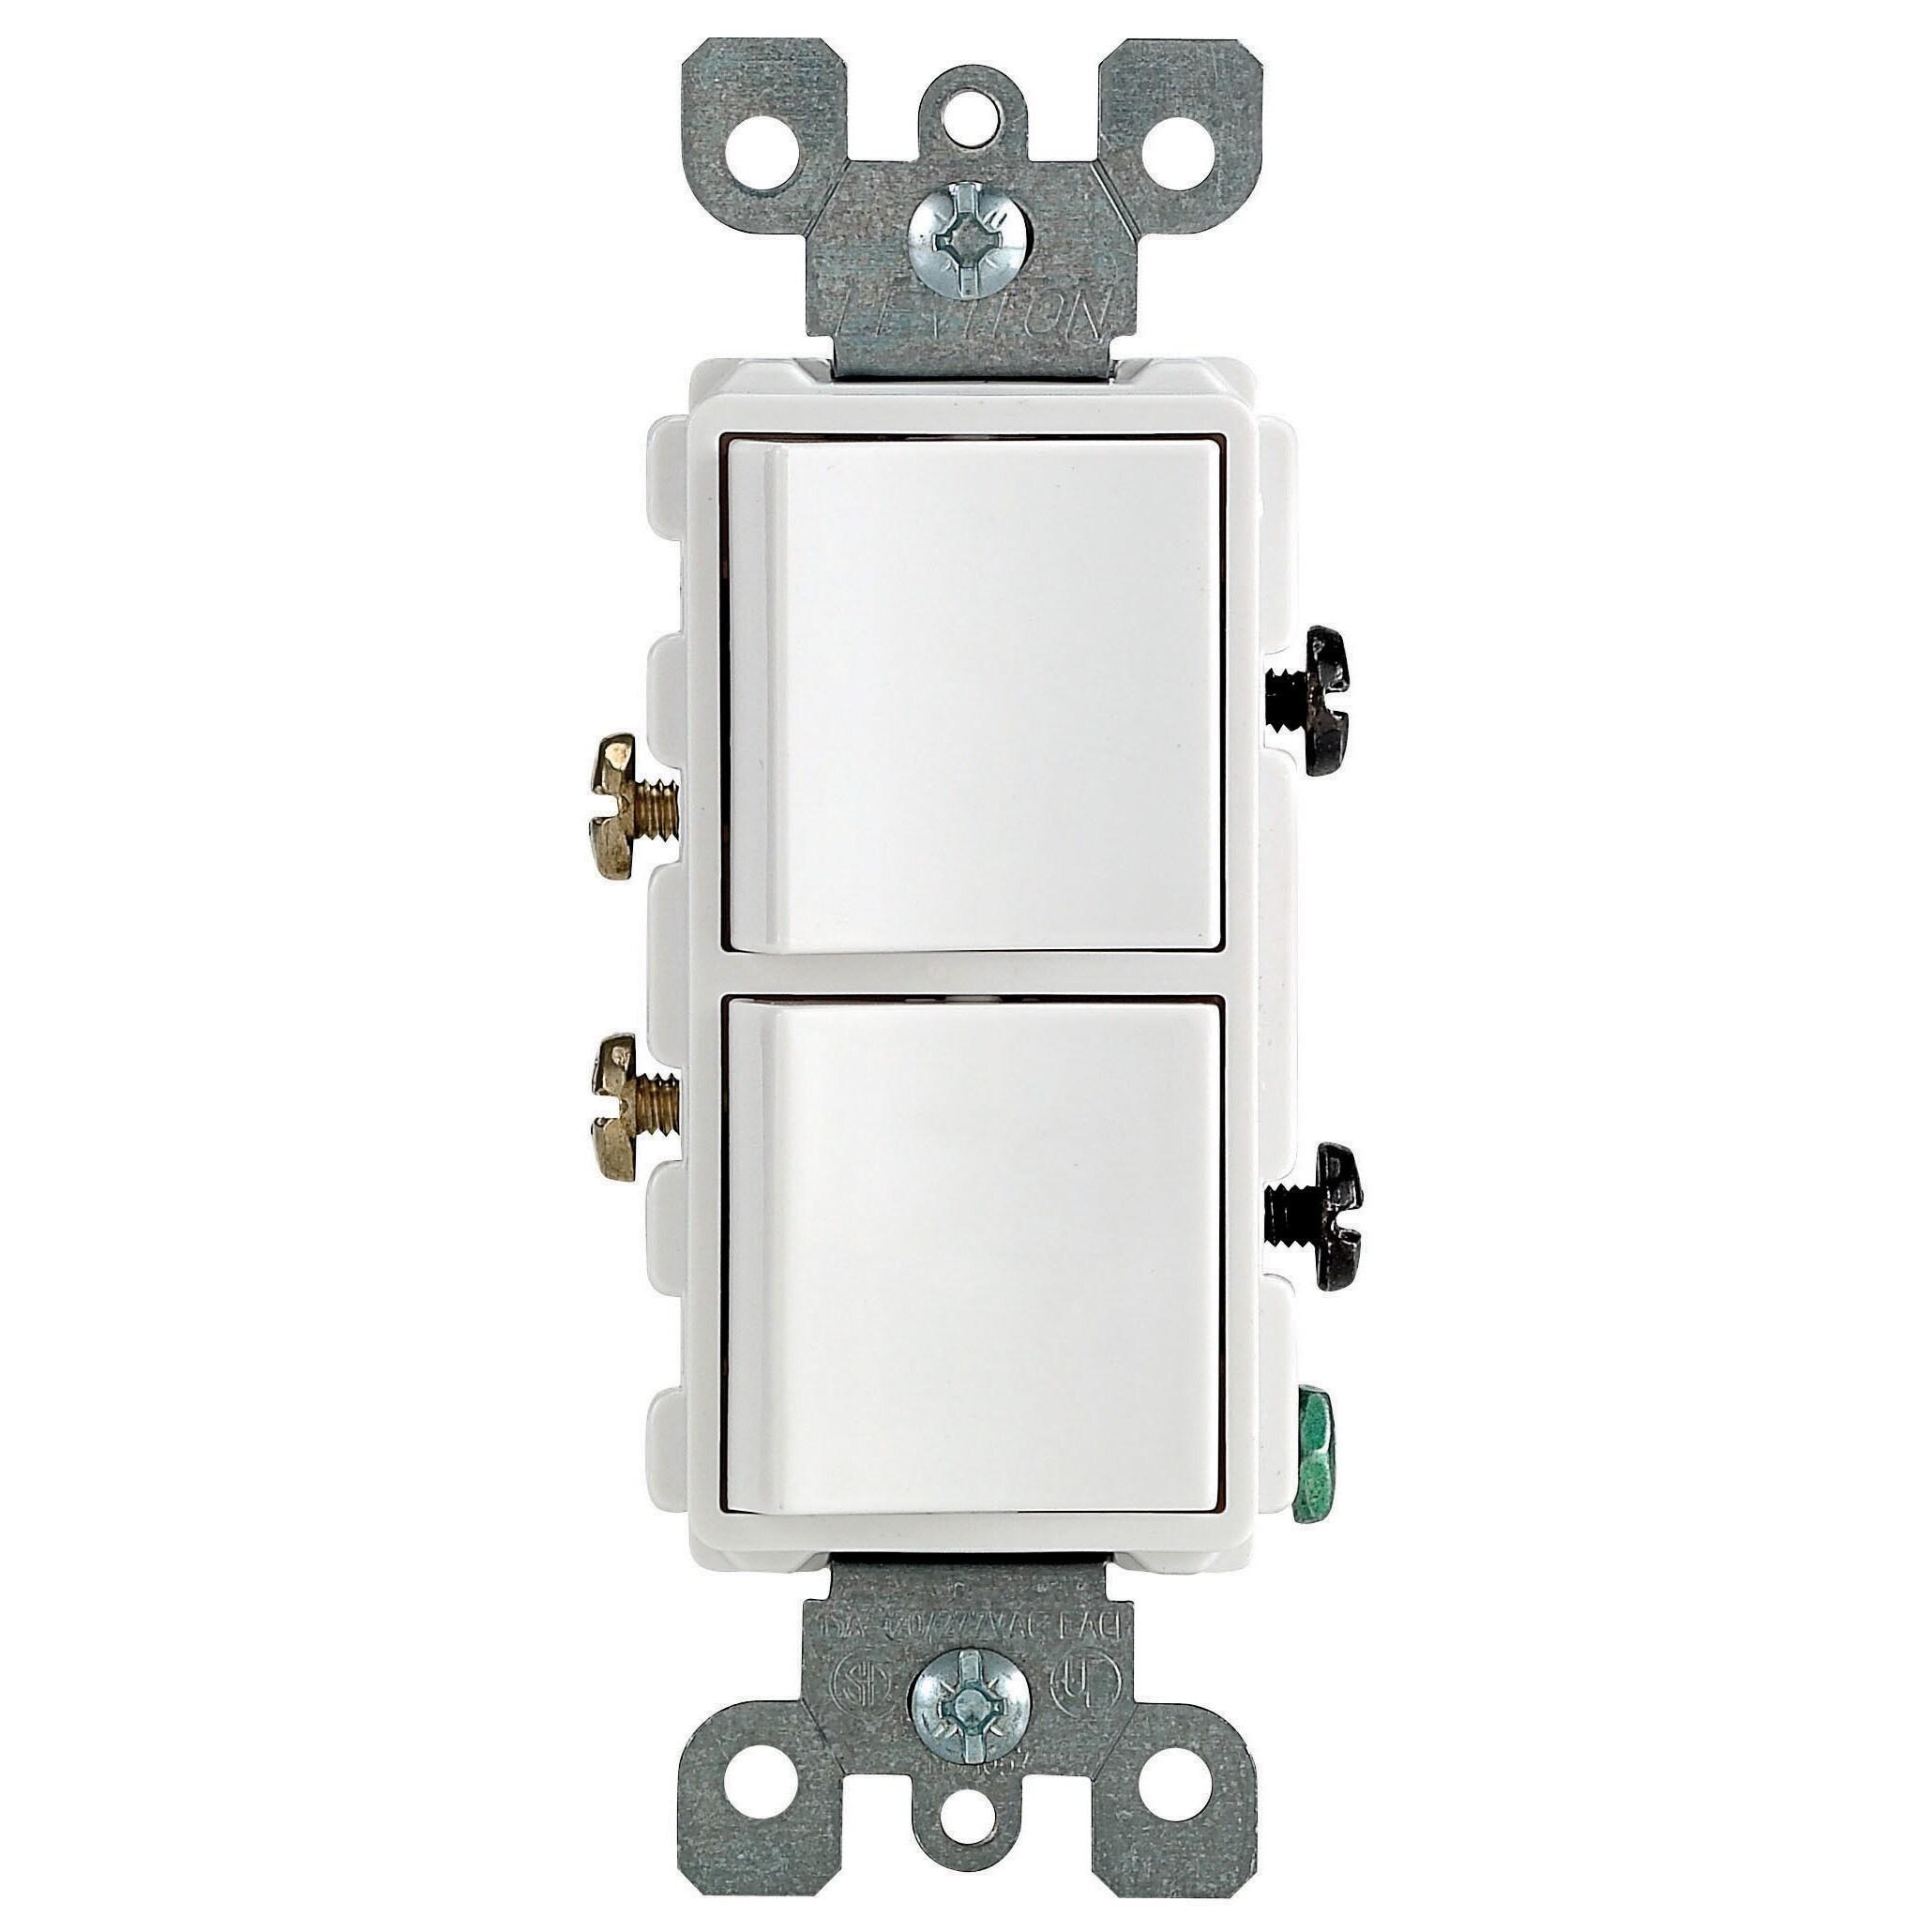 Leviton R62-05634-00W 15 Amp White Decora Dual Switch - Free ...